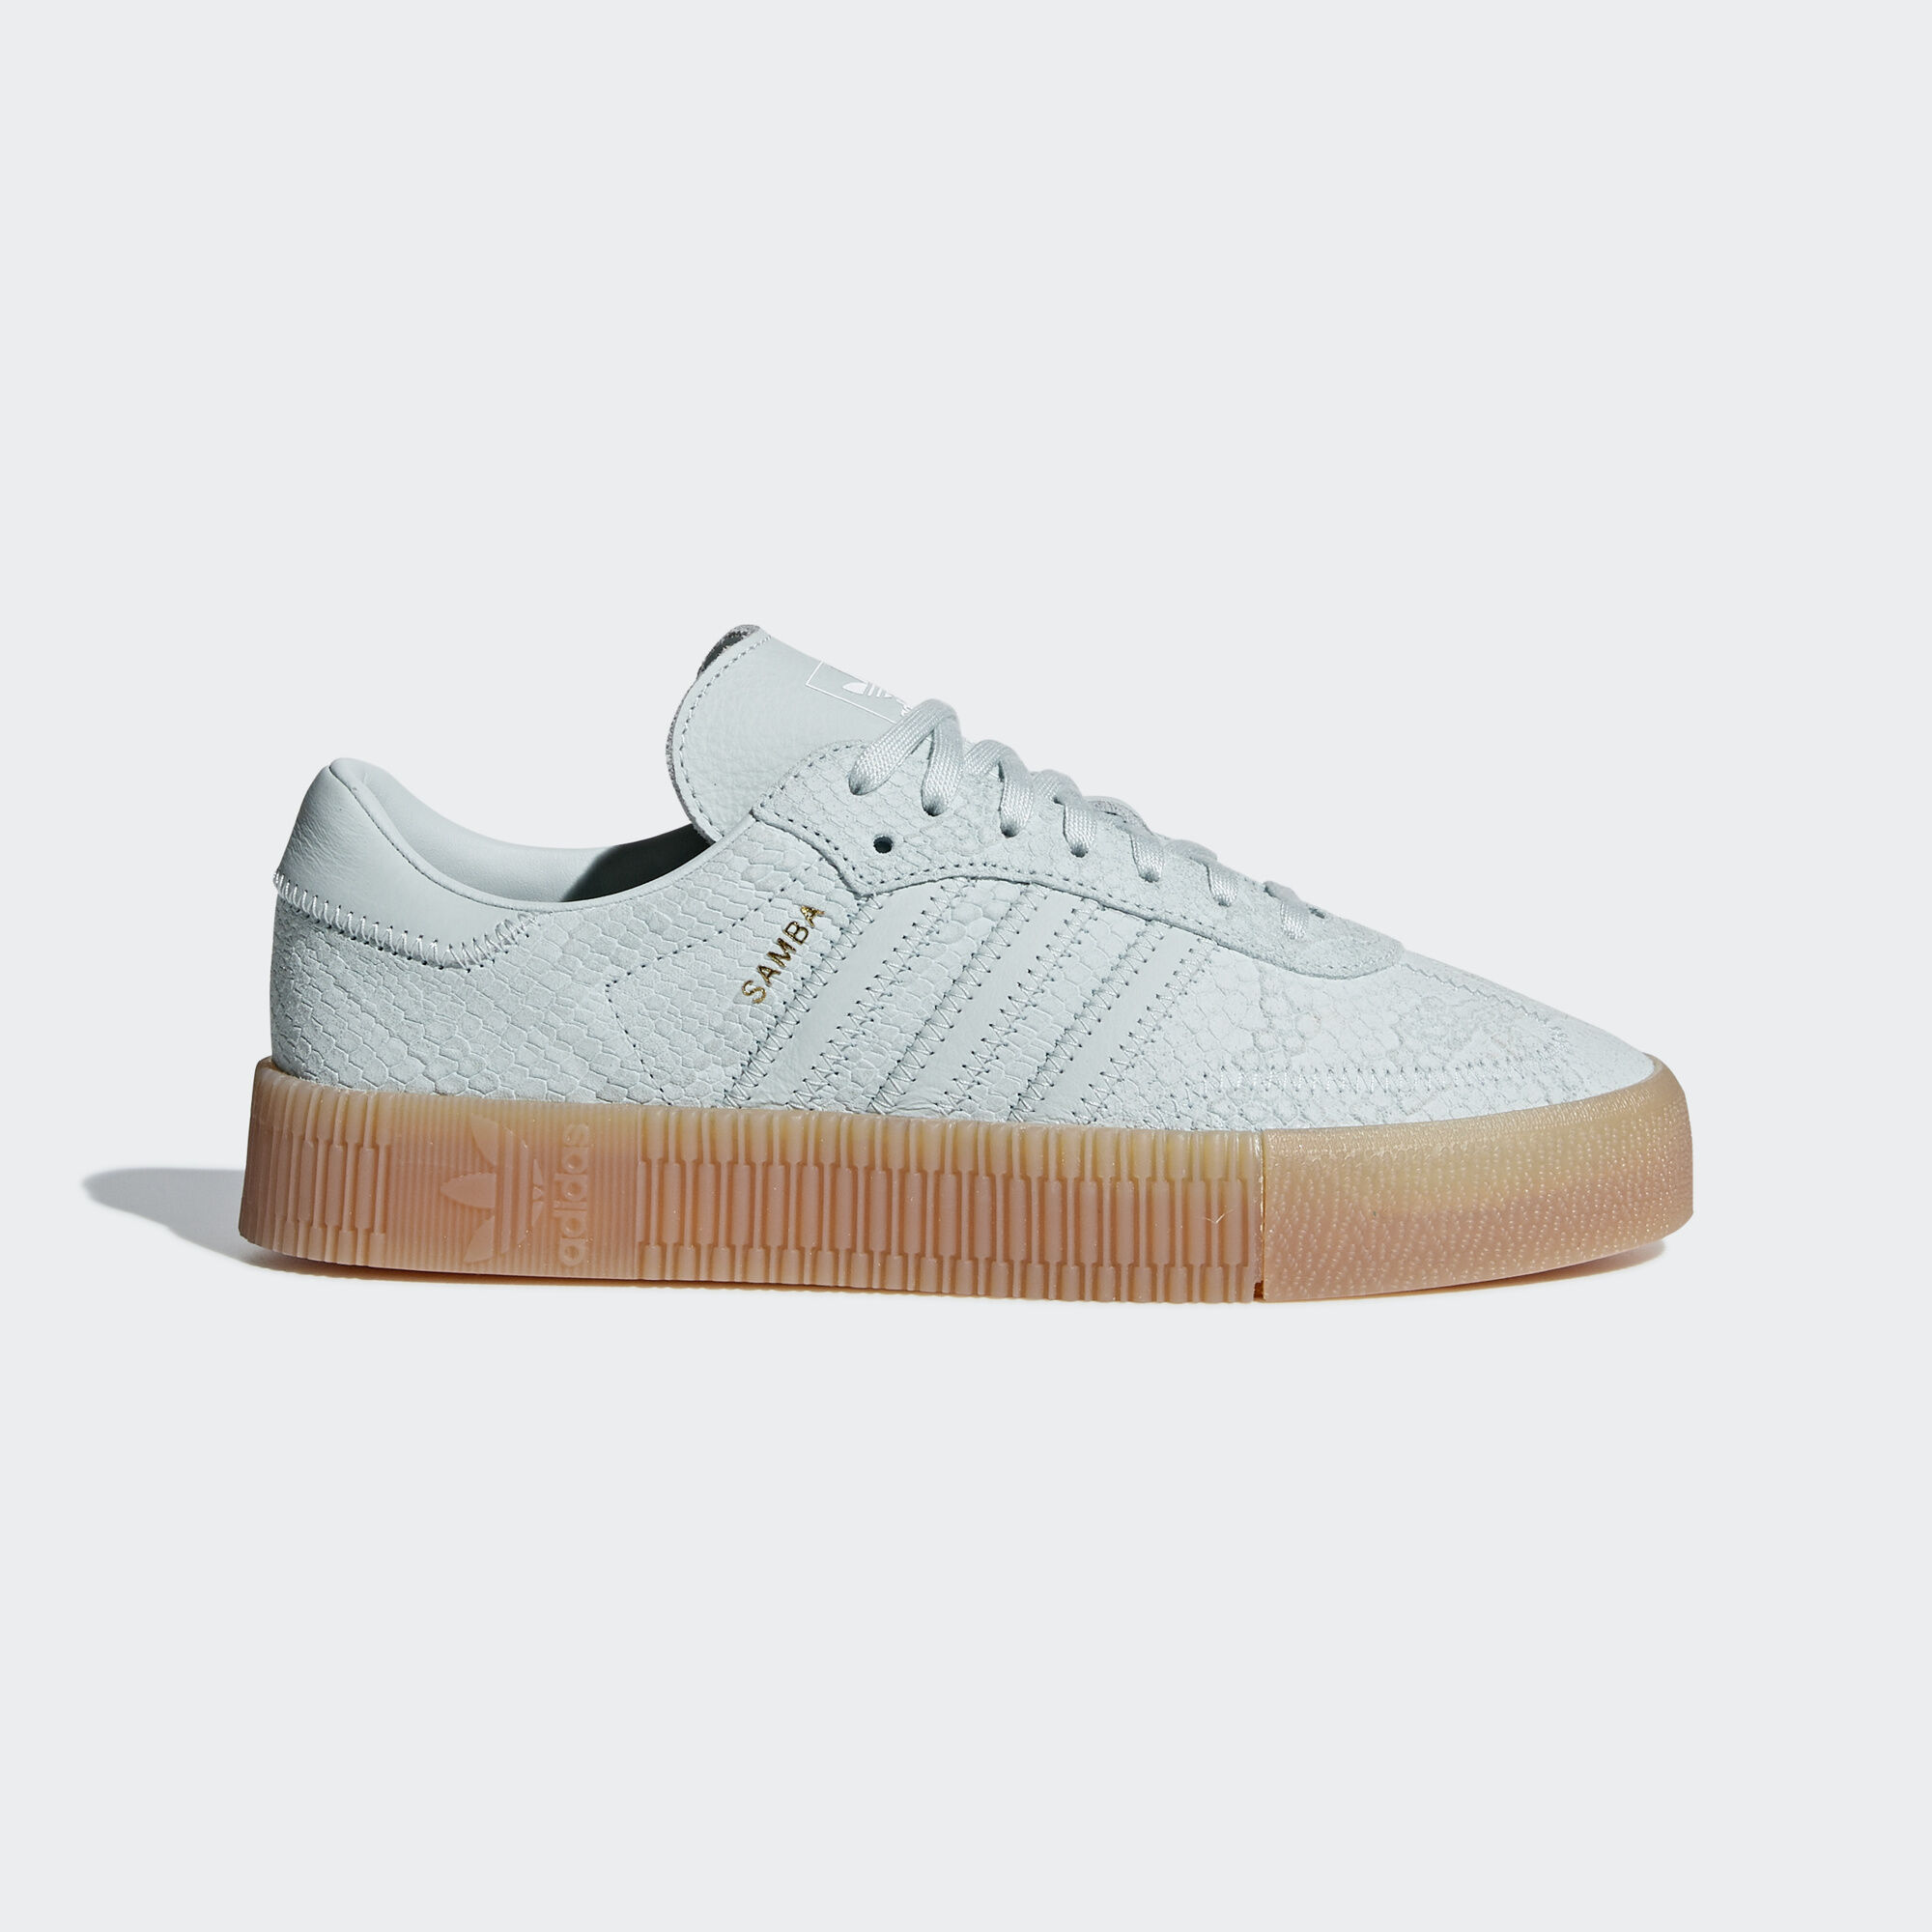 reputable site 02335 62e0f adidas - SAMBAROSE Shoes Vapour Green  Vapour Green  Gum 3 B28166